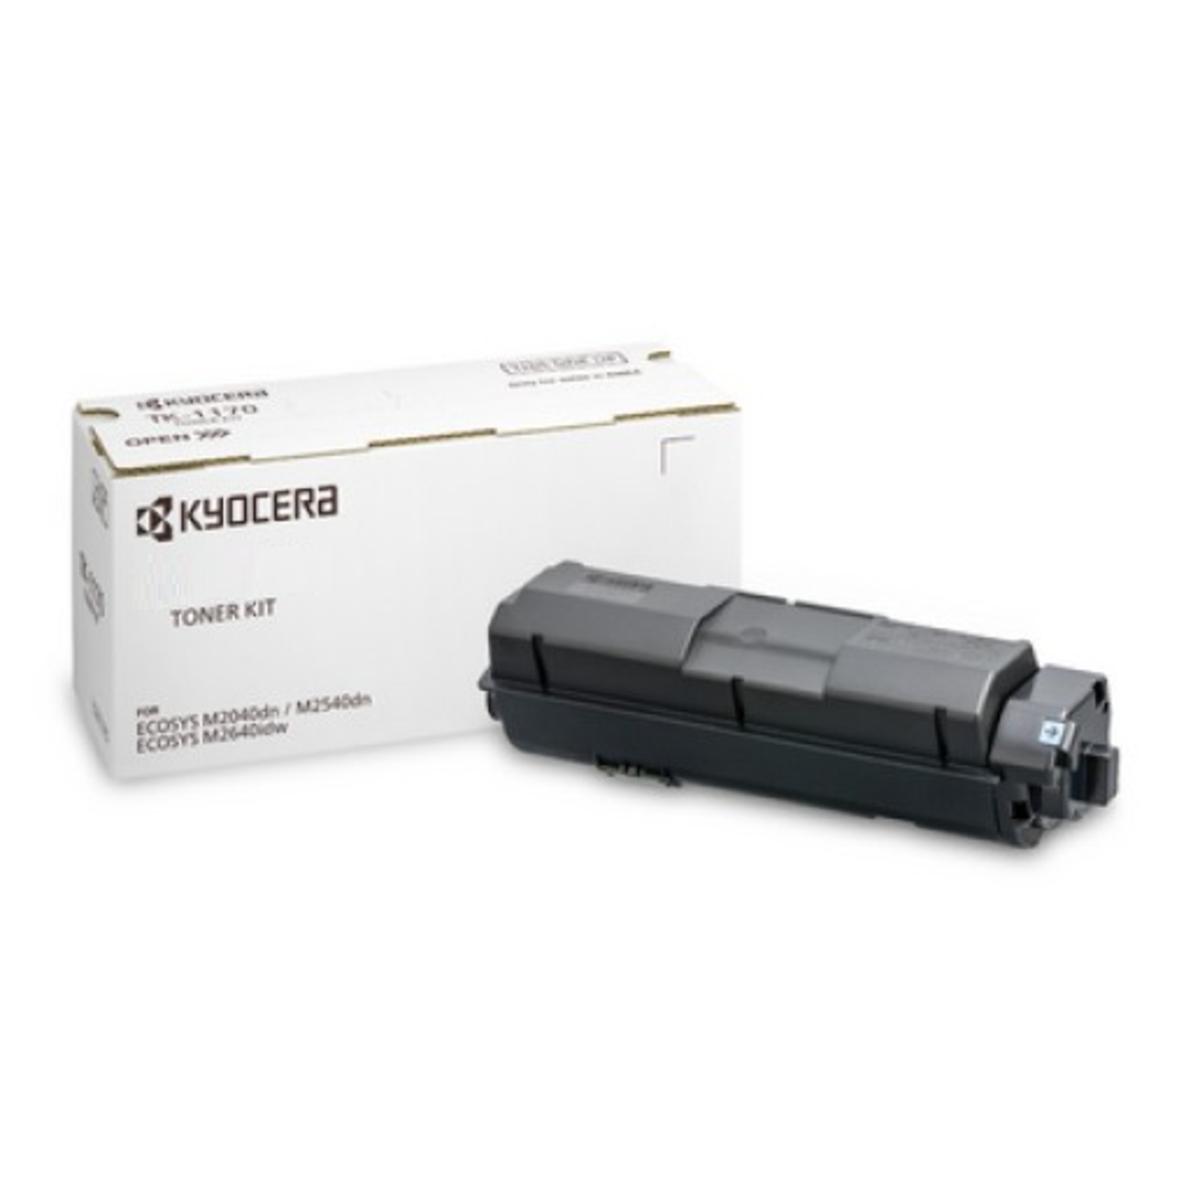 Kyocera TK-1174 Black Toner Cartridge